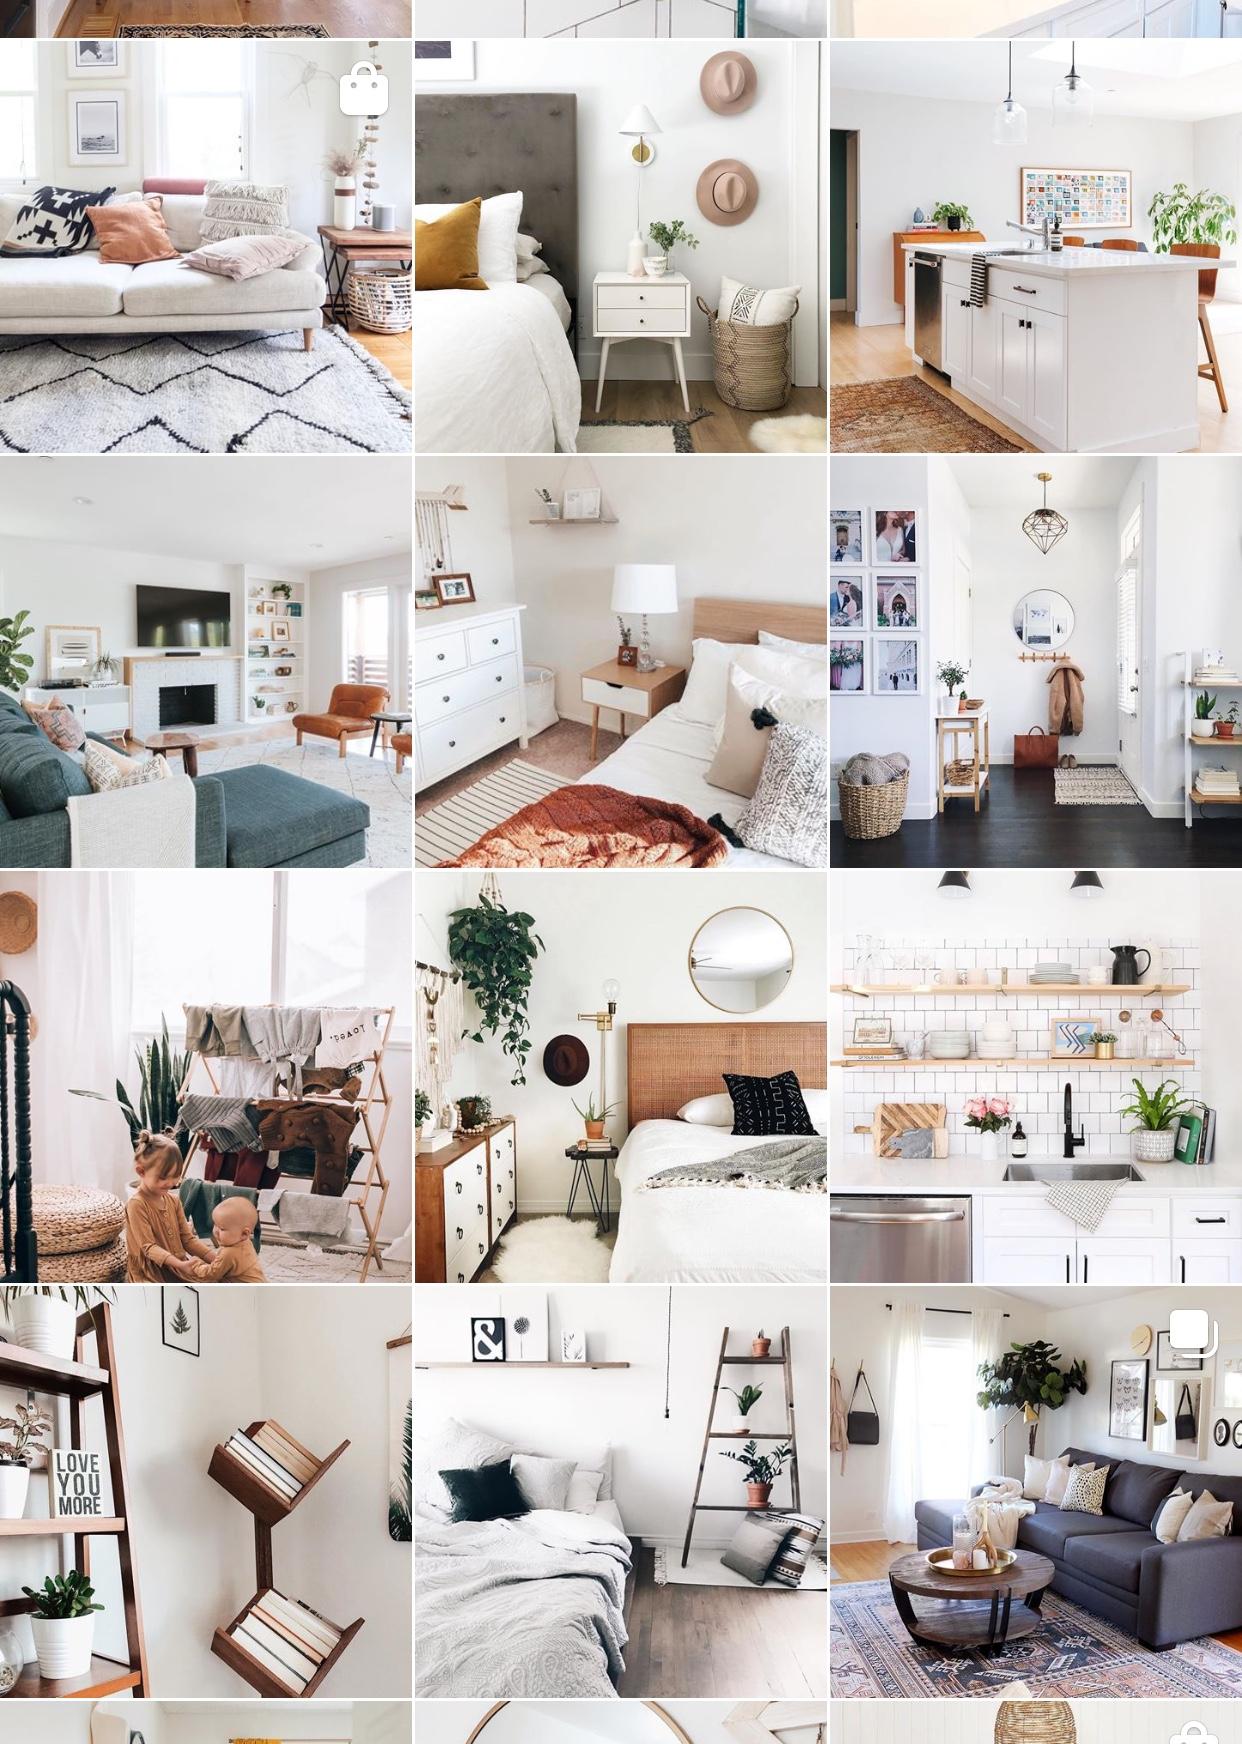 - Swoon Worthy Spaces on Instagram - June ROUNDUP